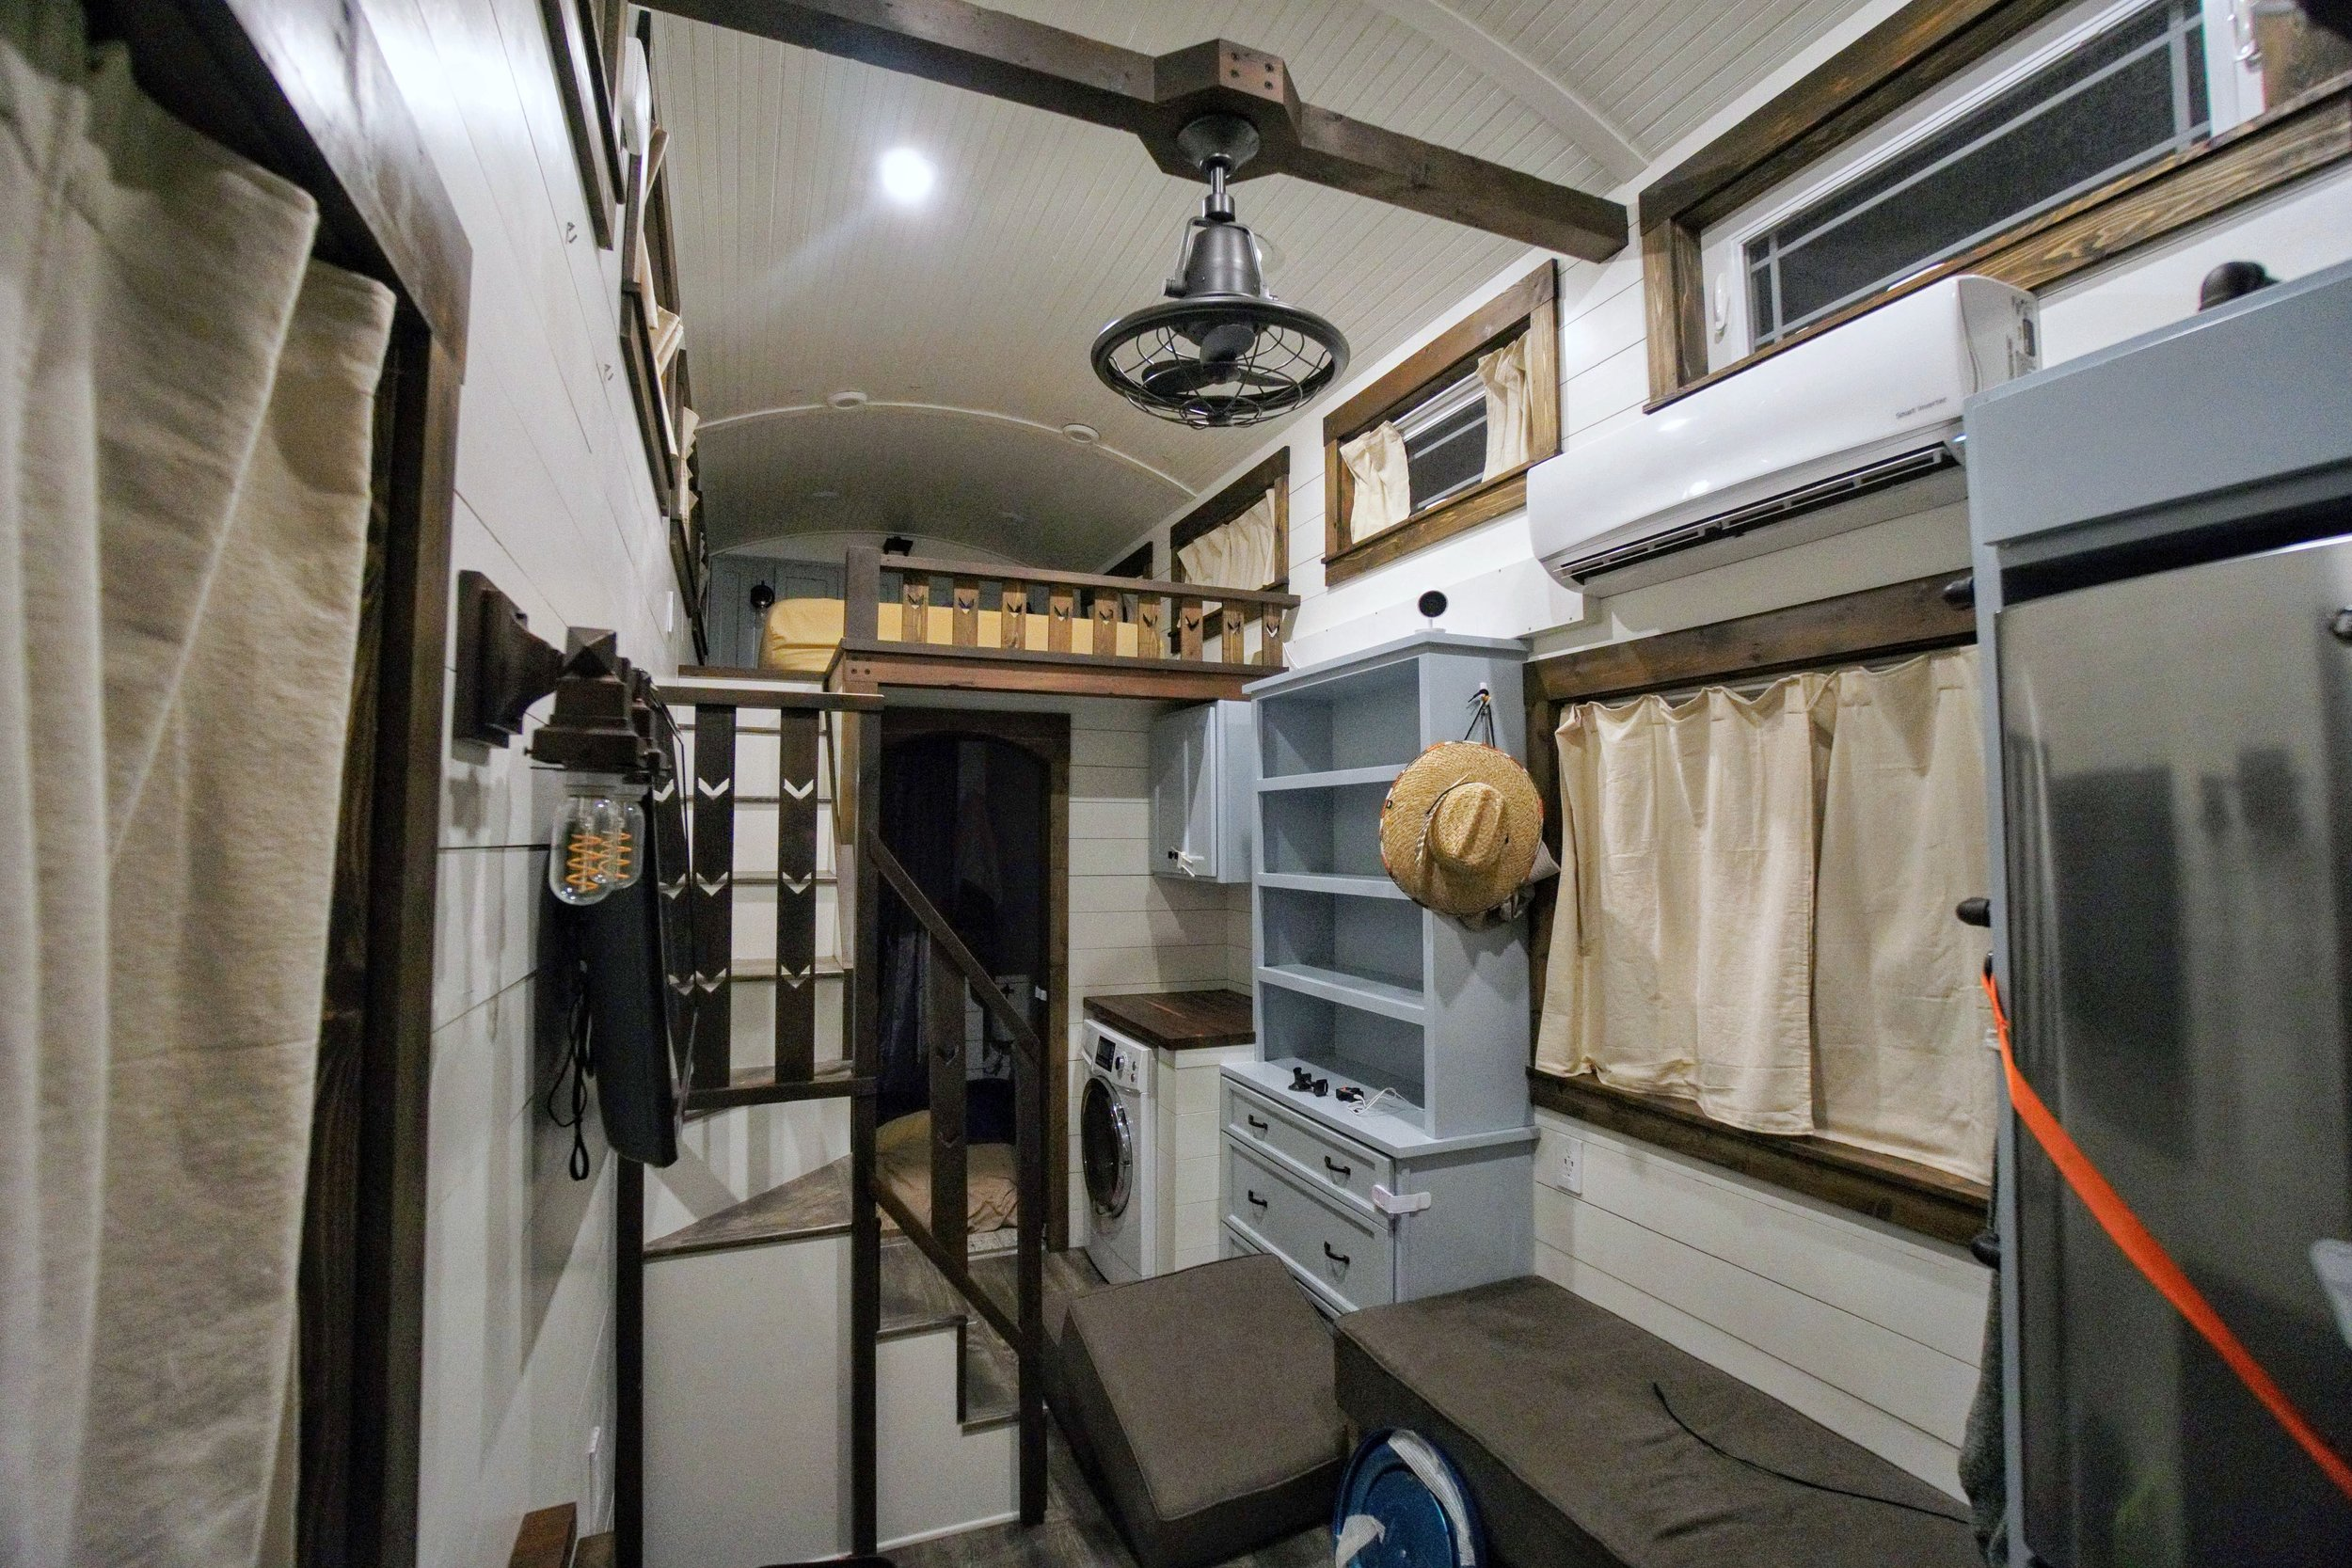 Moving a tiny home straps fridge child-lock cabinet bathroom sliding doors packing transportation tiny home